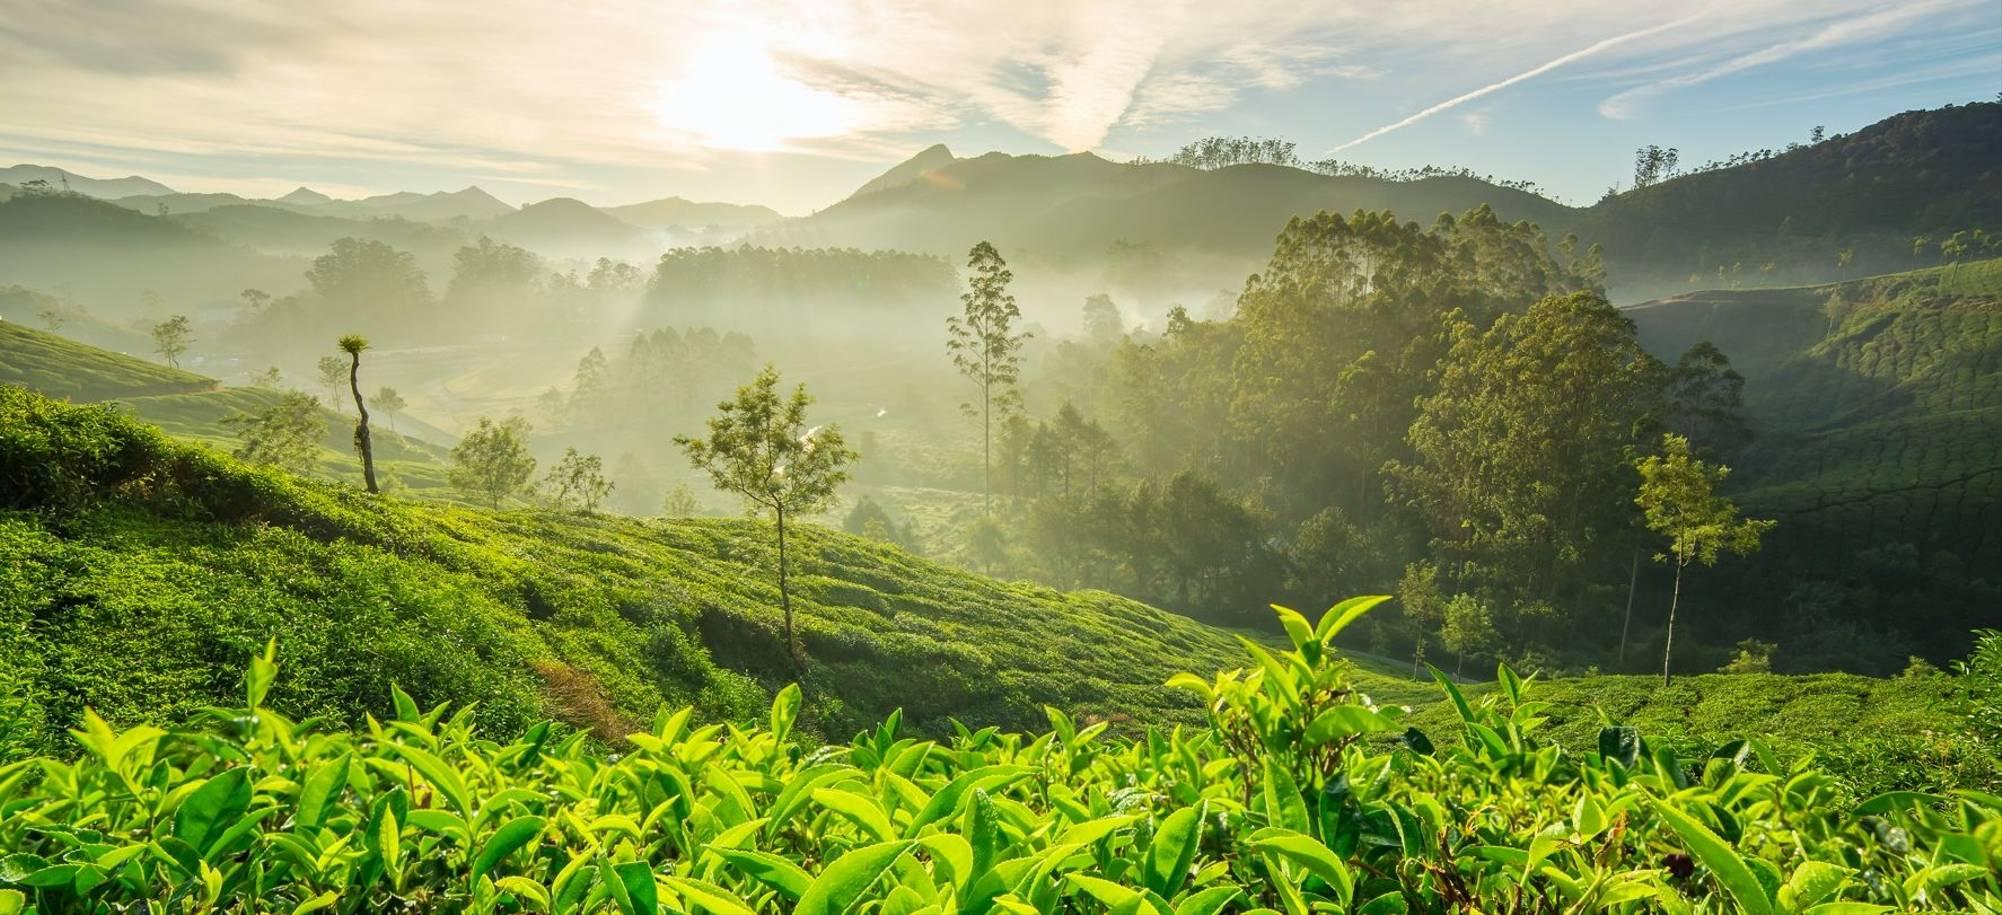 17 Day - Colombo, Tea plantation - Itinerary Desktop.jpg